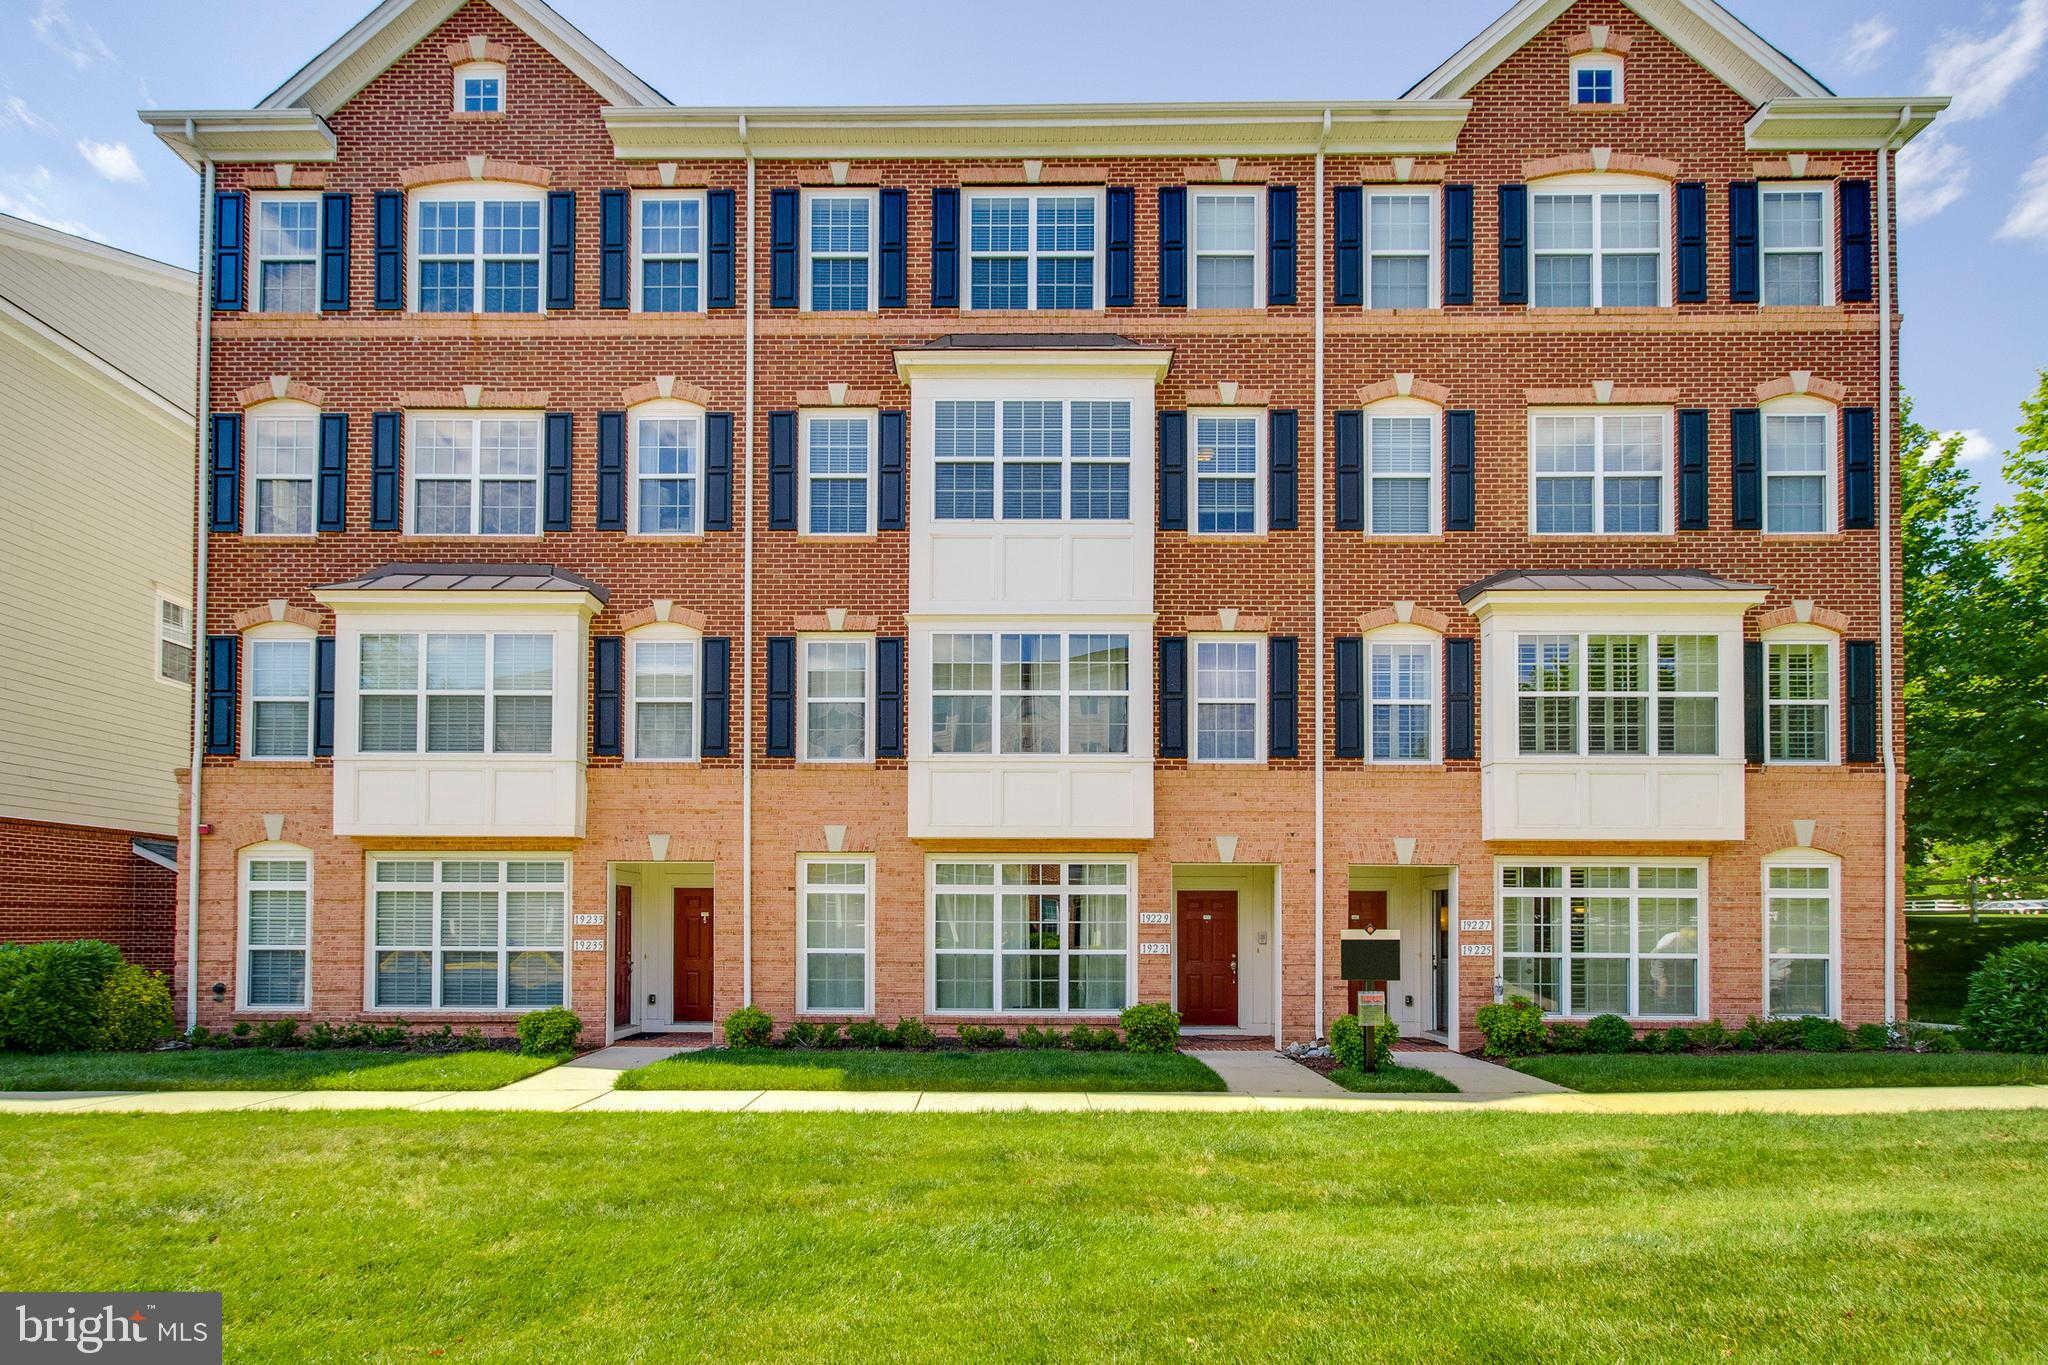 19229 Winmeade Drive, Leesburg, VA 20176 now has a new price of $379,000!